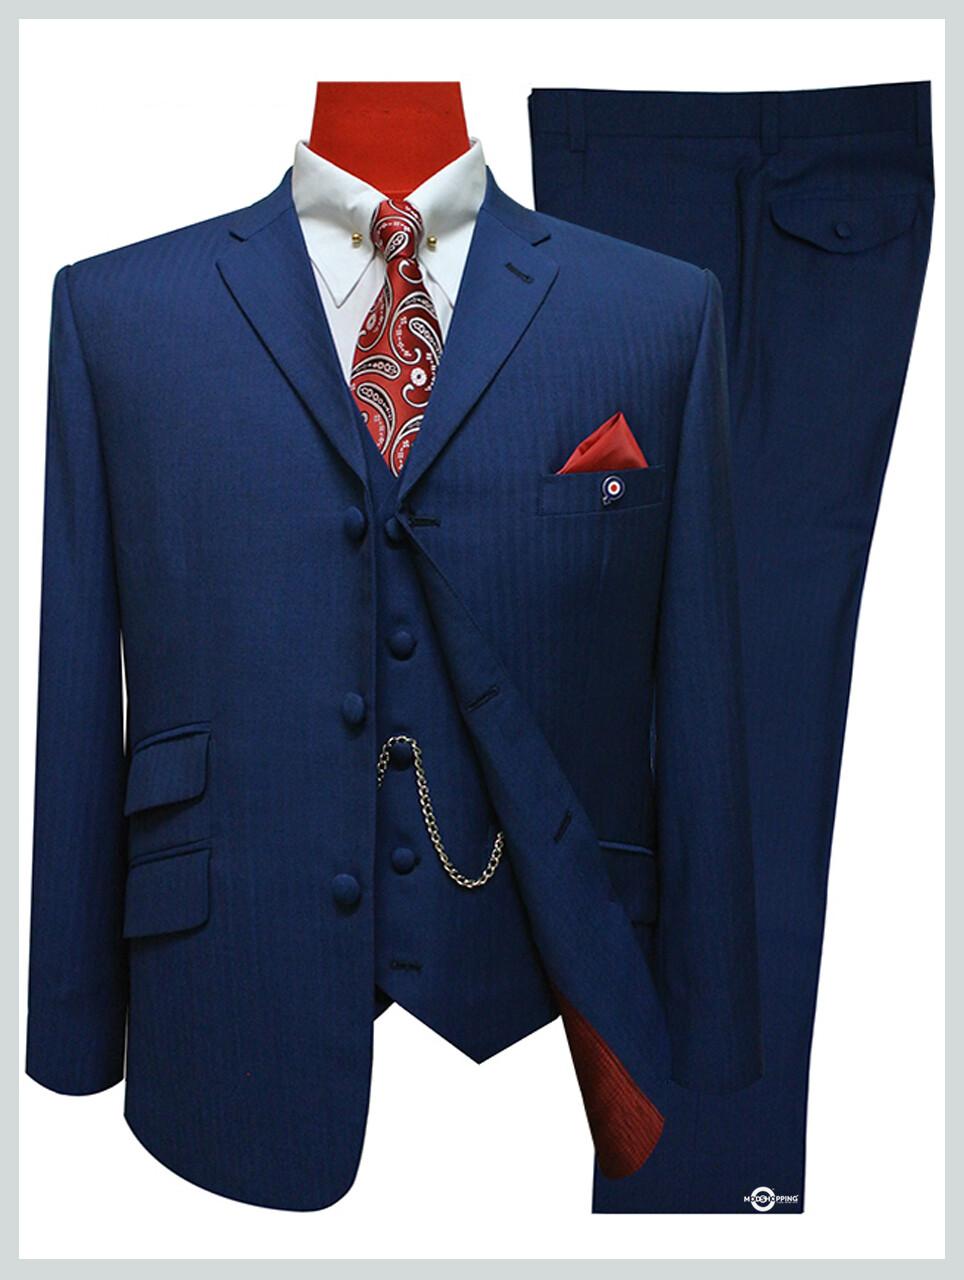 Herringbone Suit| Mens 3 Piece Sapphire Blue Tailored Mod Suit Uk.